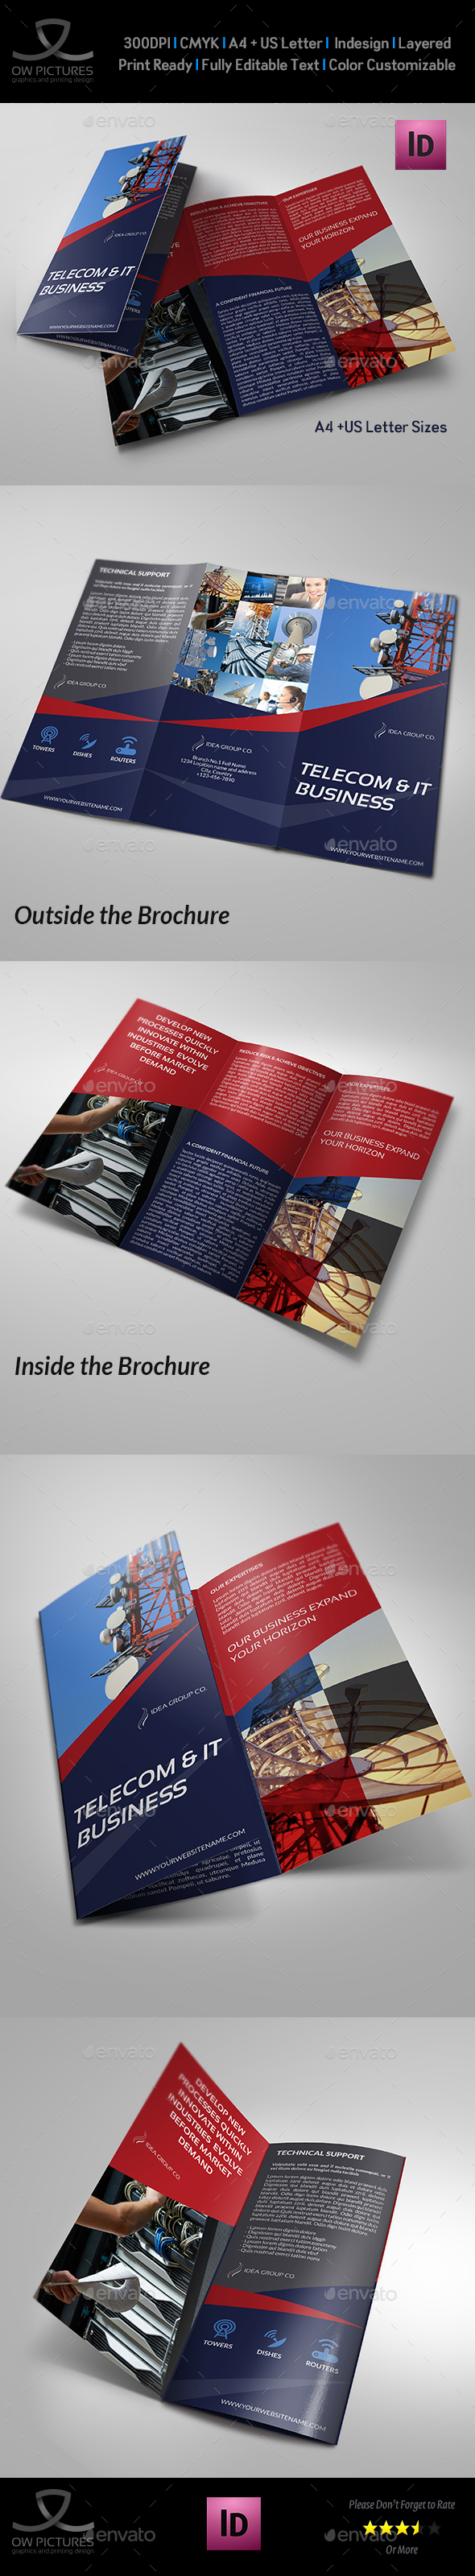 Telecom Services Tri Fold Brochure Template - Brochures Print Templates